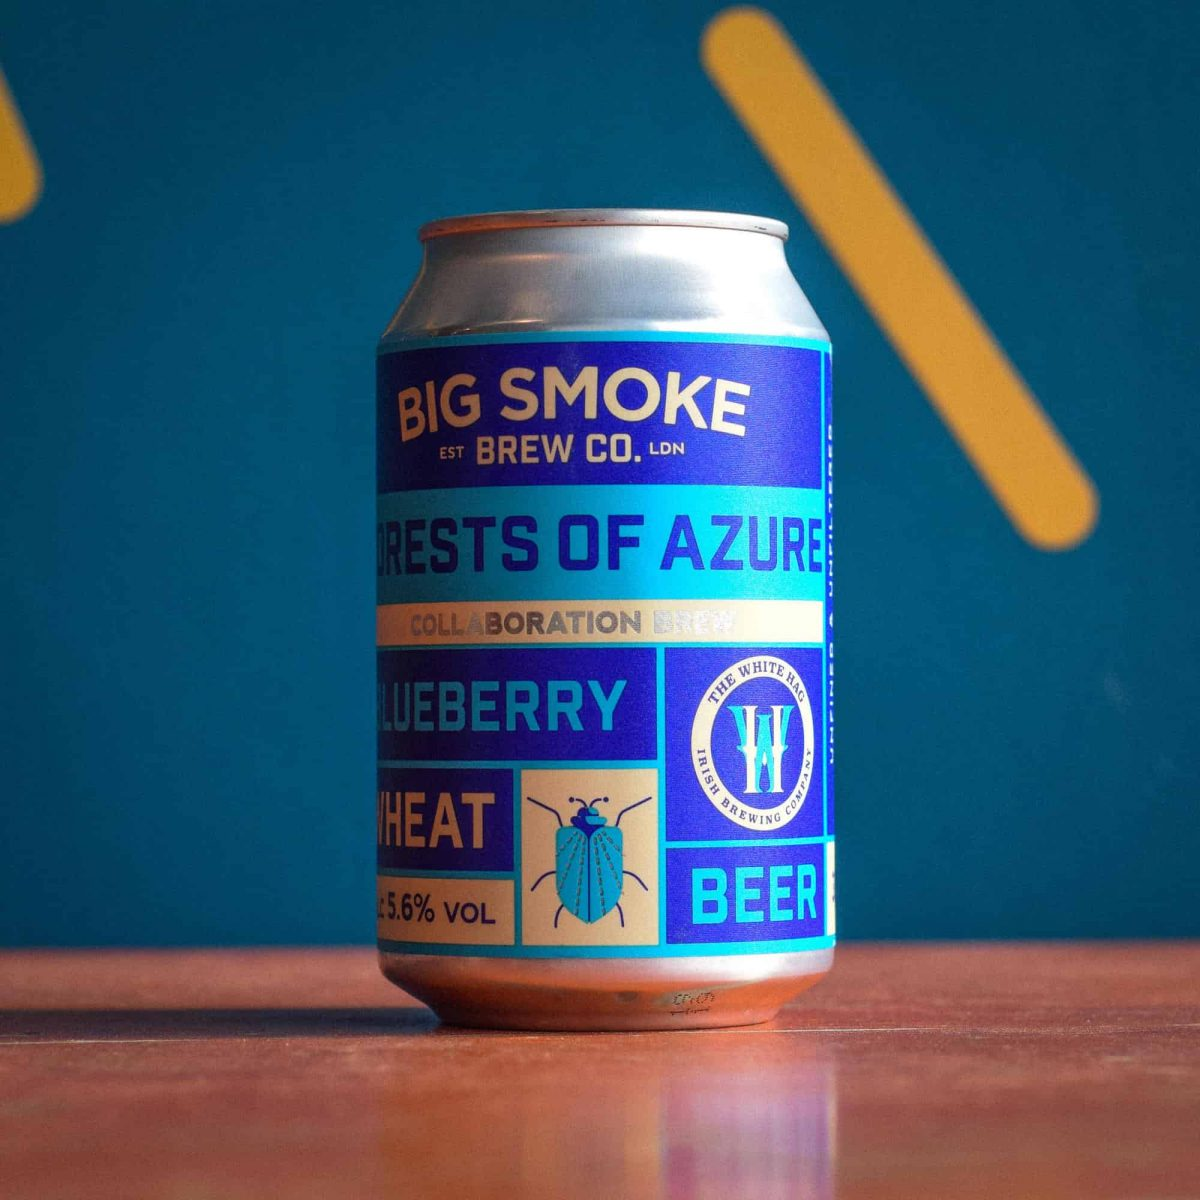 Big Smoke Forests of Azure